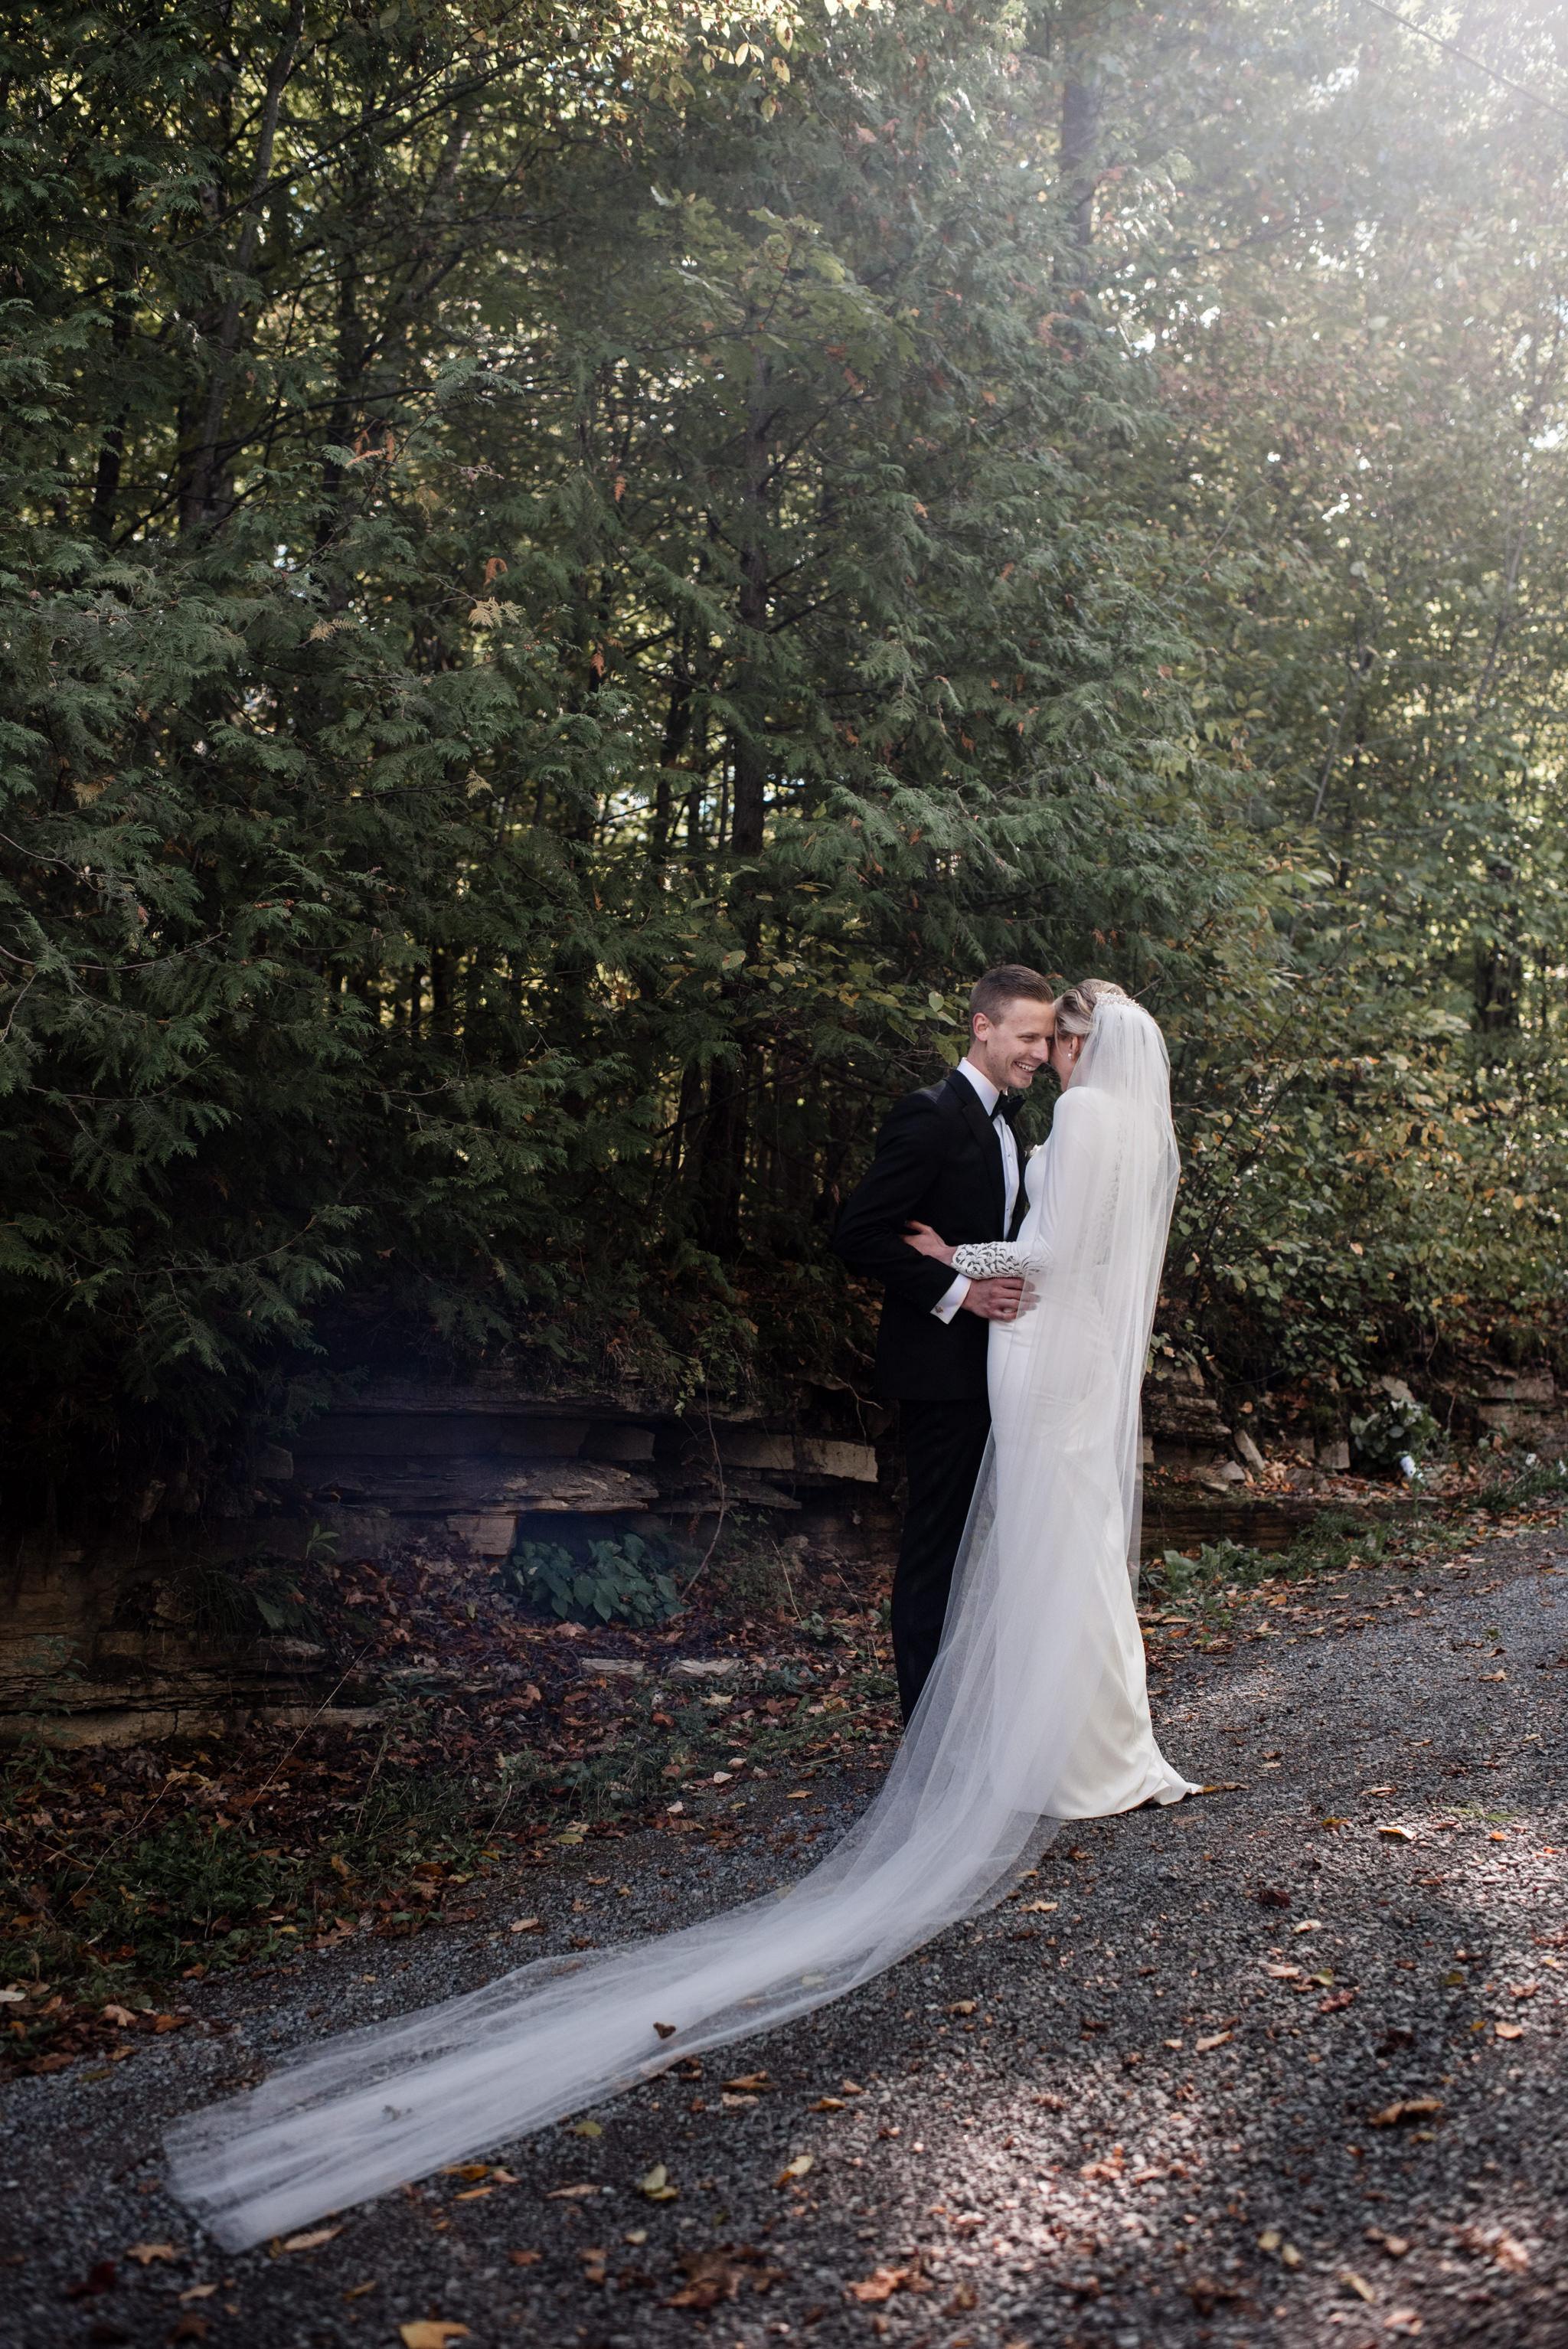 050-wedding-photos-in-forest-ontario-cottage-toronto.jpg